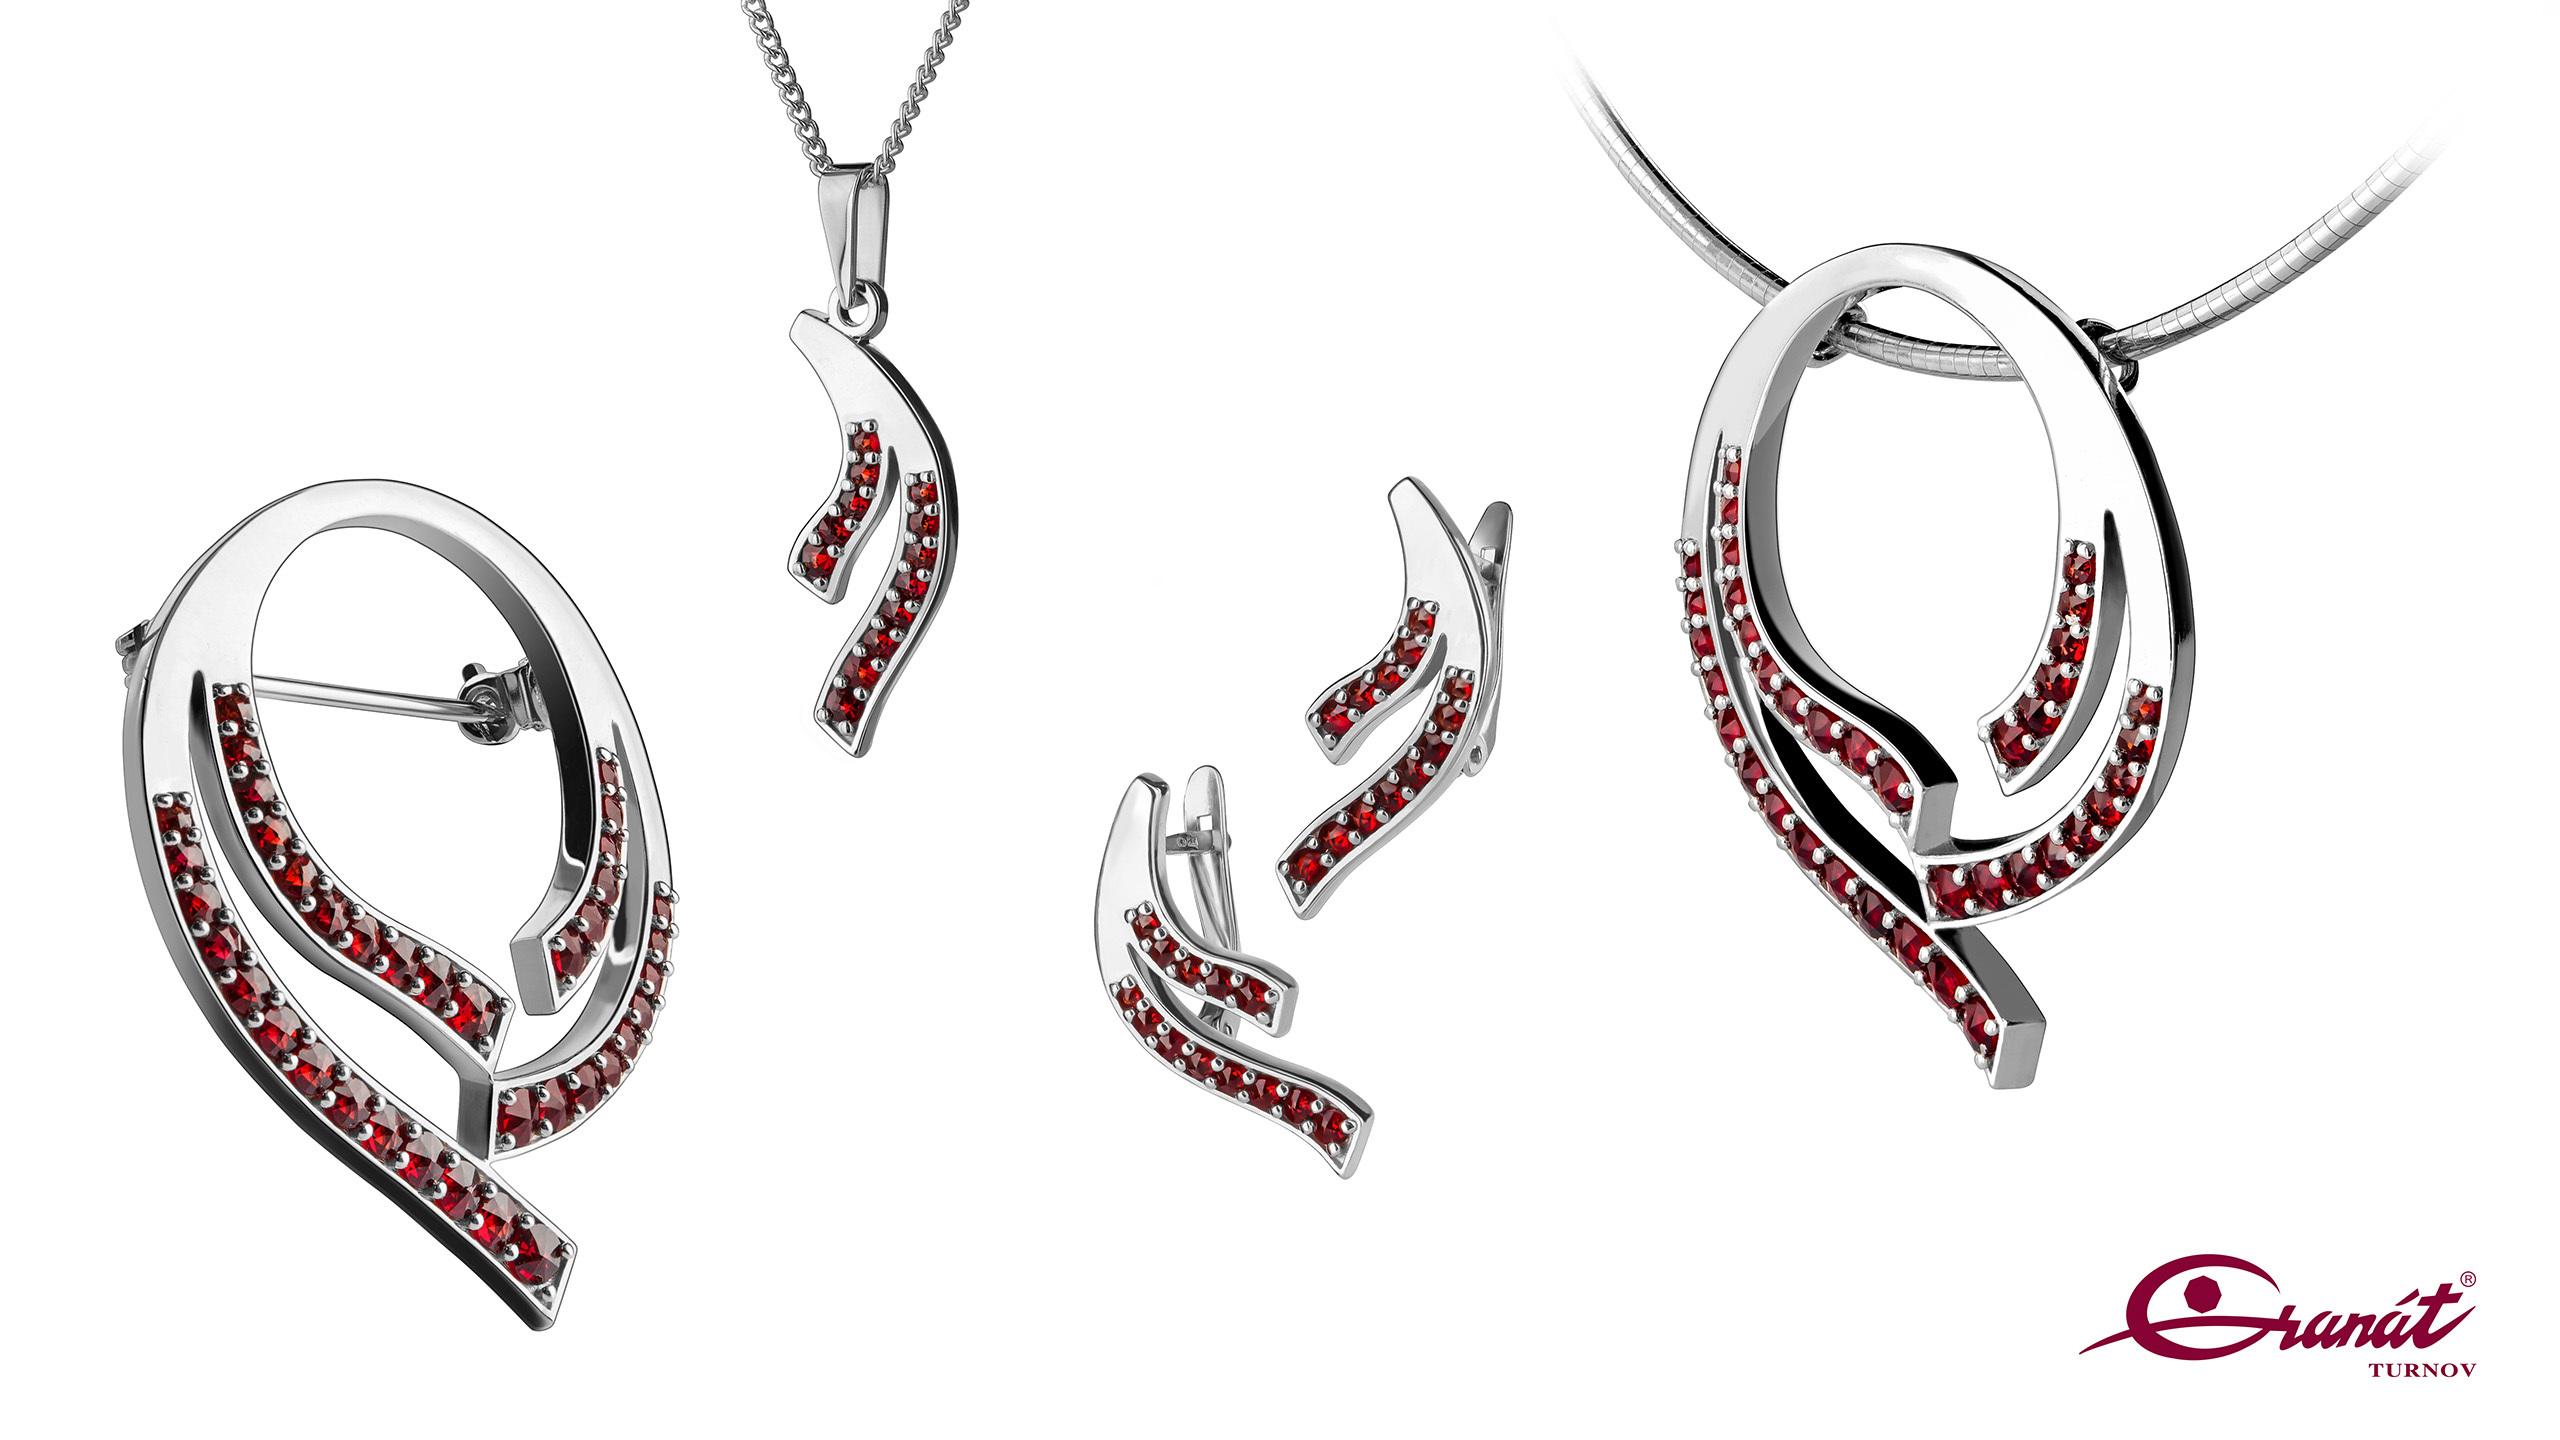 Bohemian Garnet - product photography of jewellery